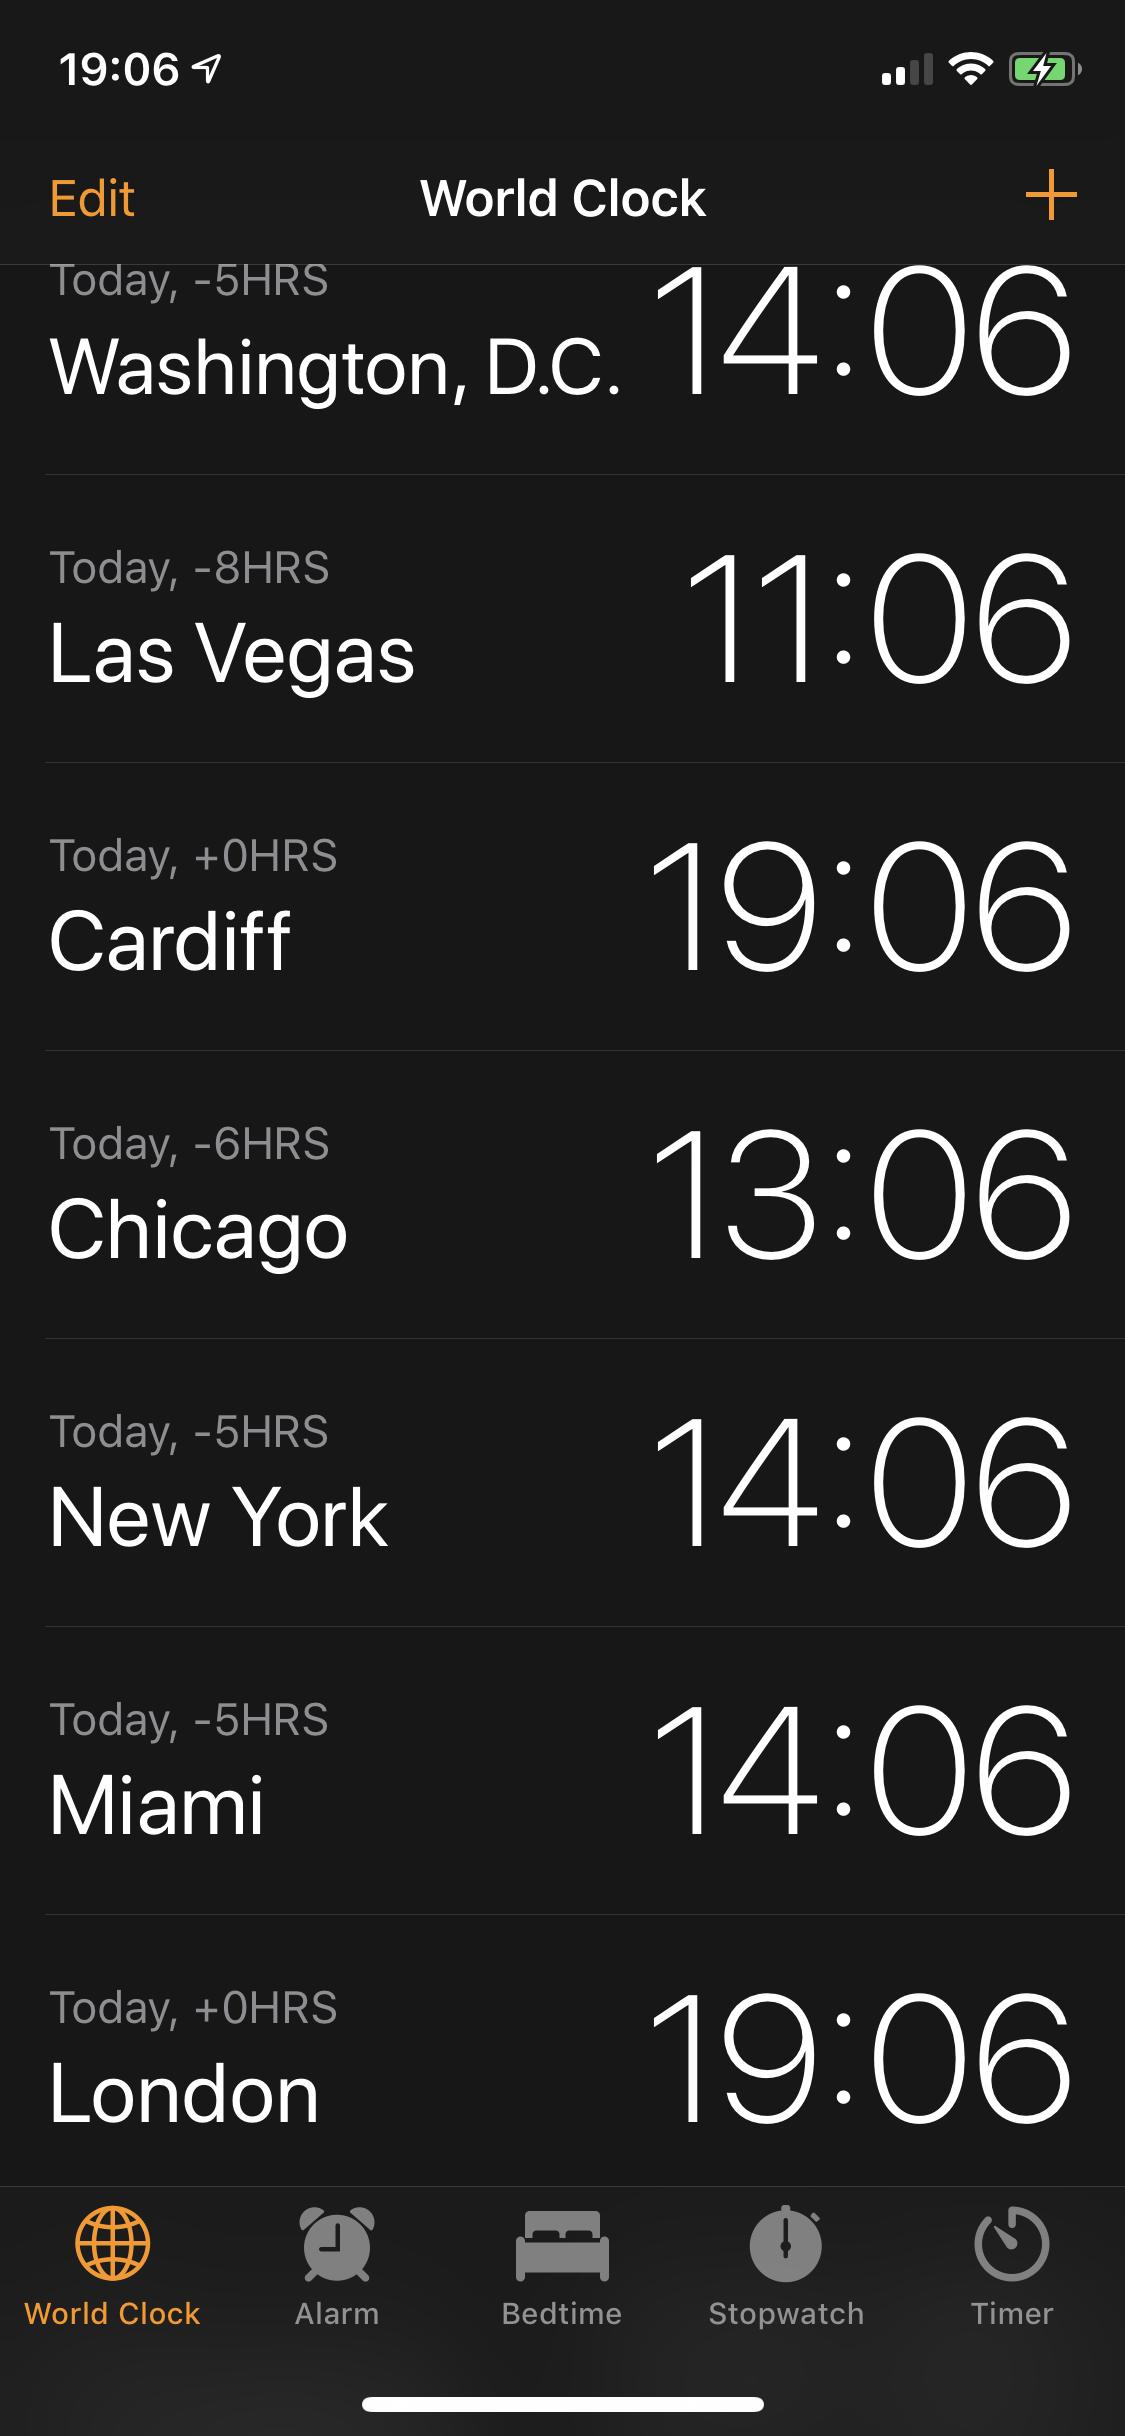 Change world clock - Apple Community